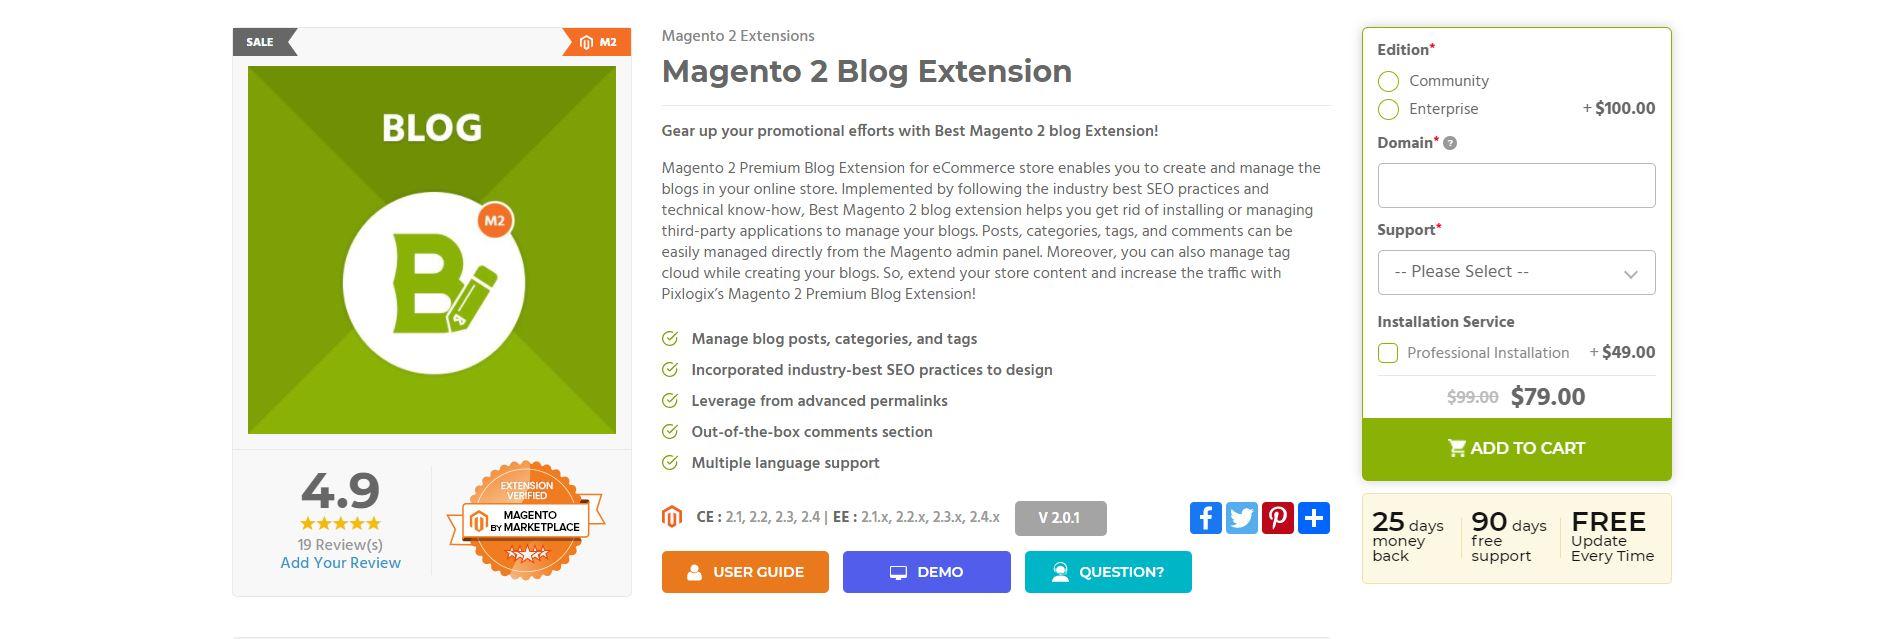 Magento Blog Extension